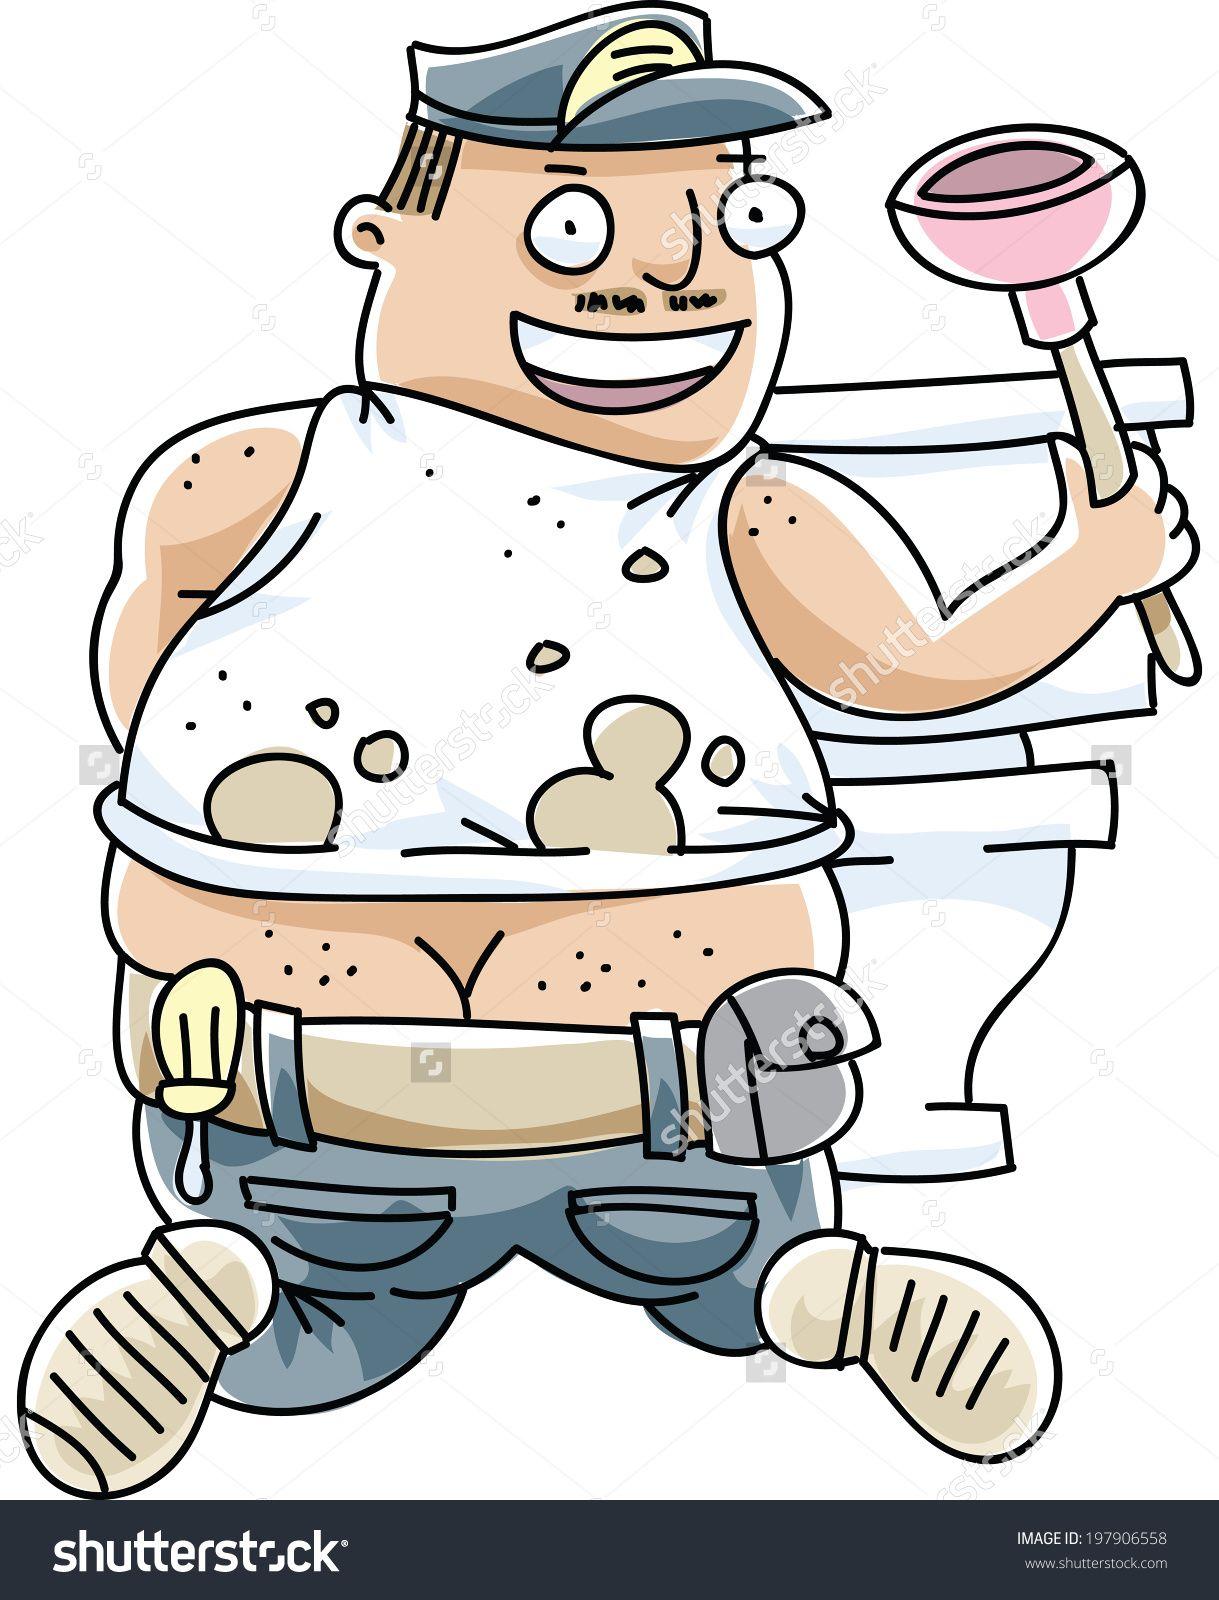 pin by desireew on plumber butt cracks pinterest plumbing